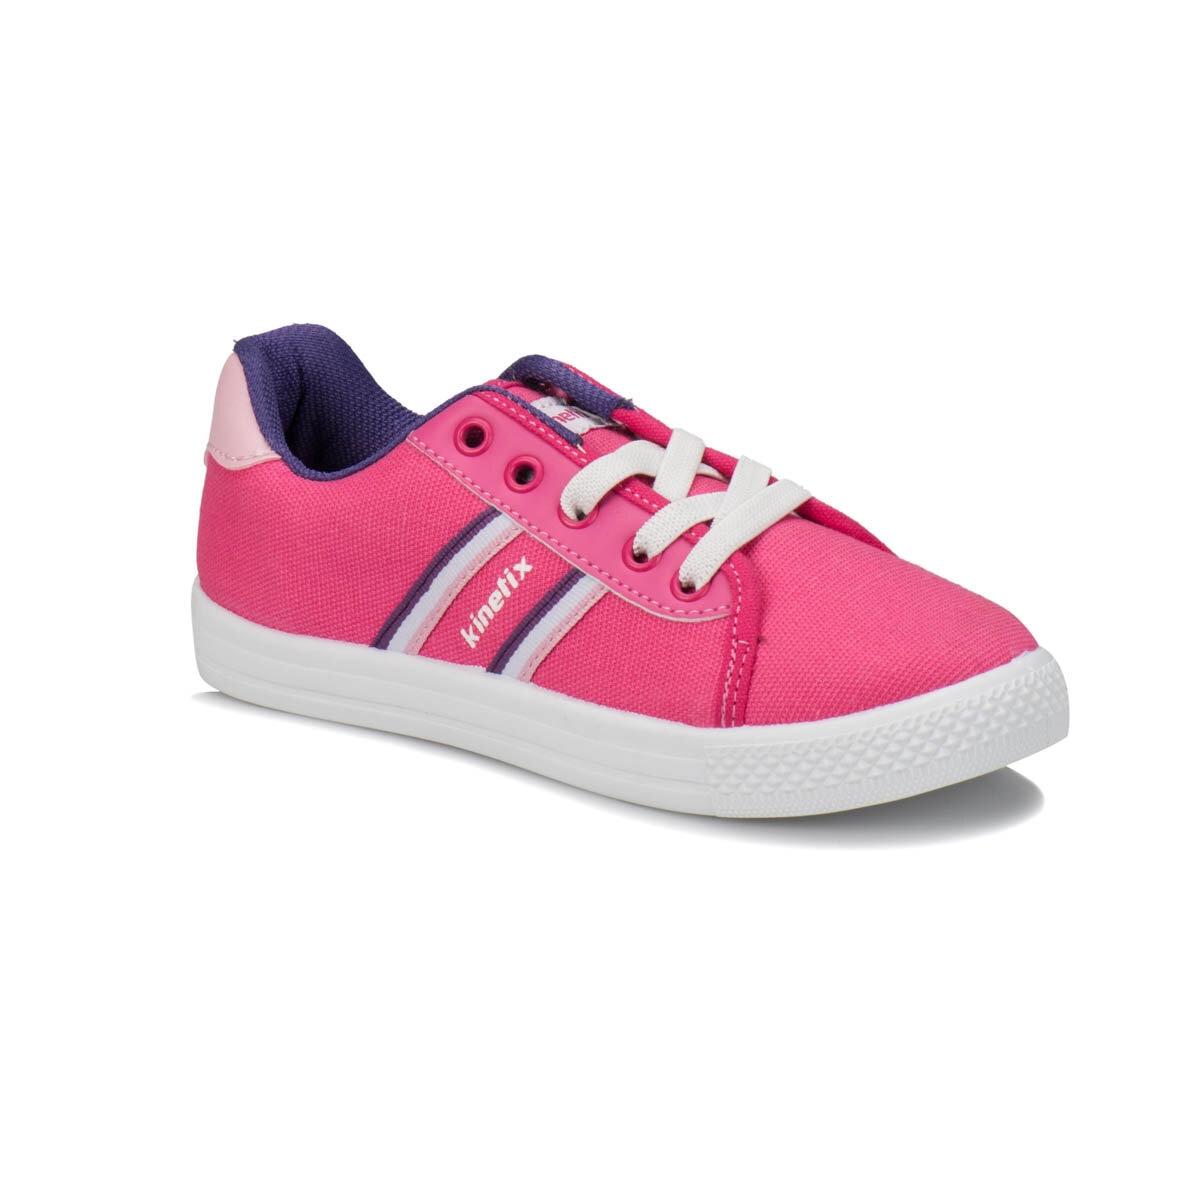 FLO KOTAN Fuchsia Female Child Sneaker Shoes KINETIX